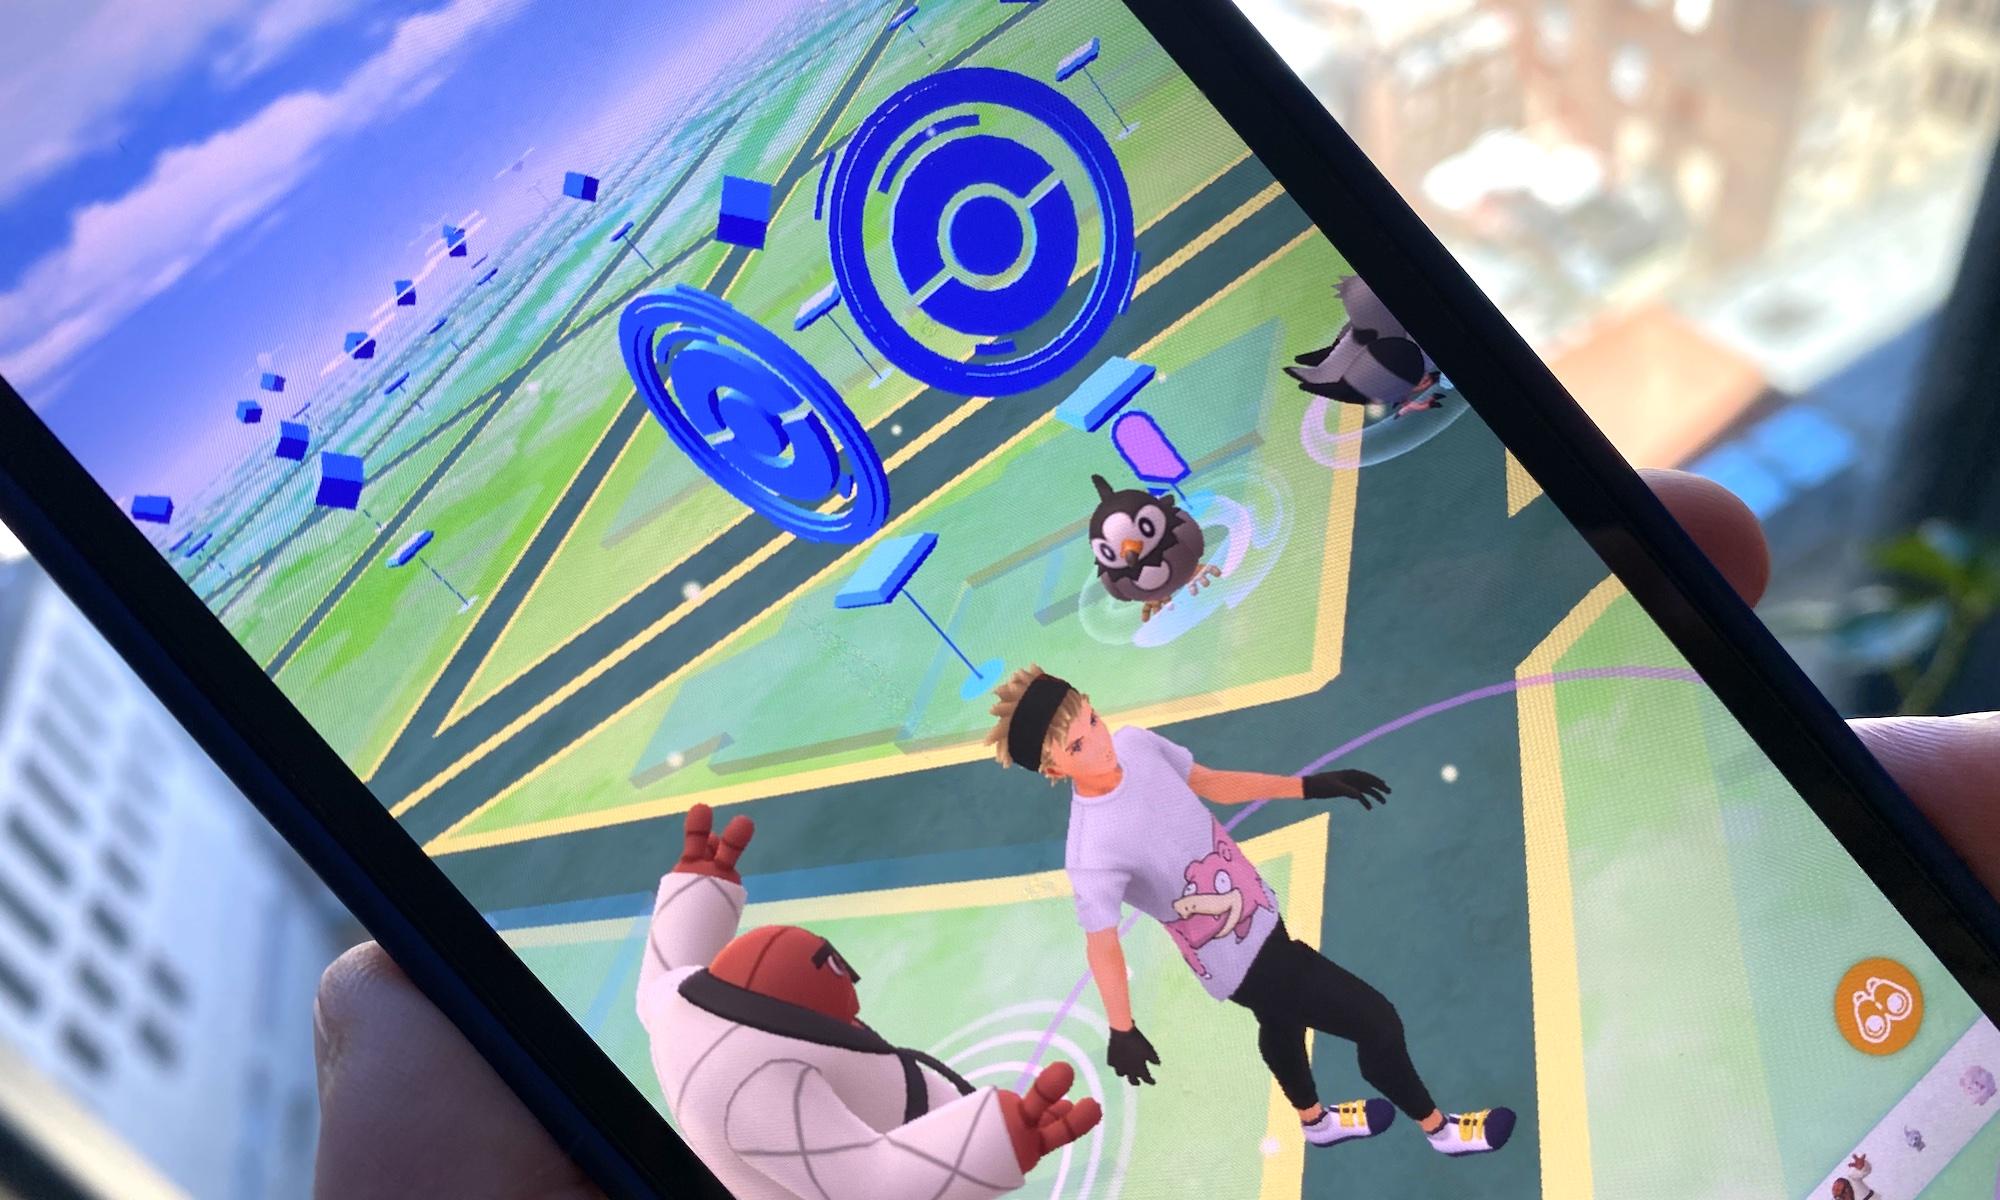 A trainer walks near Pokestops in a photo of Pokémon Go running on an iPhone